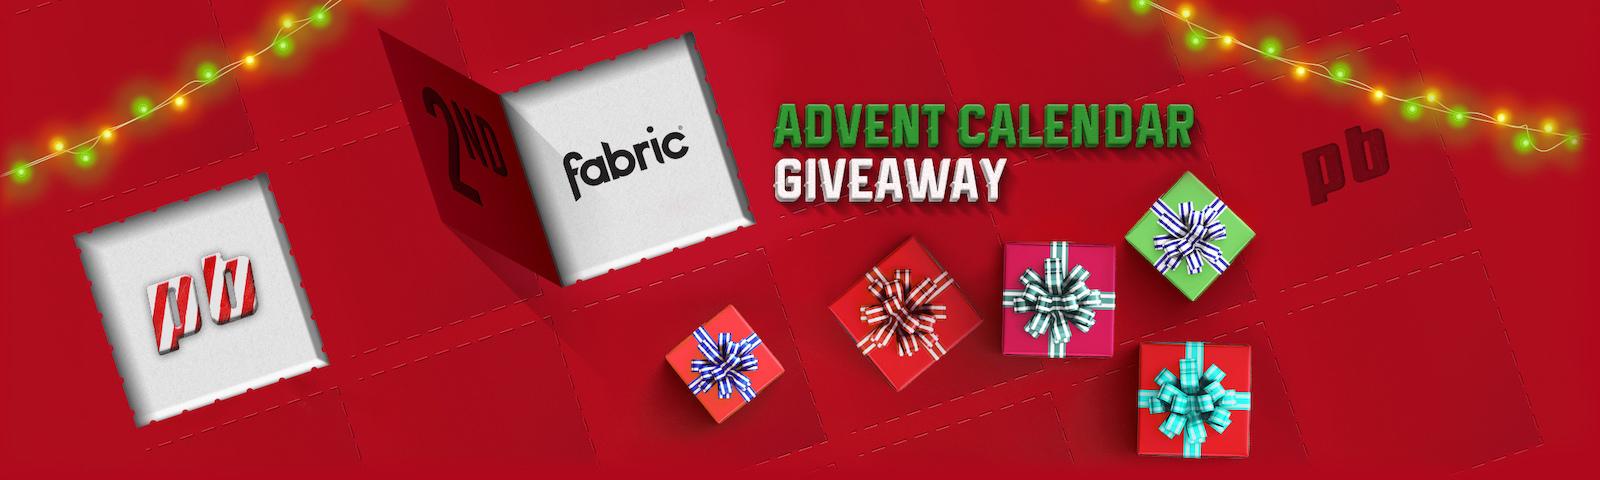 Advent Banner Dec 2 - Fabric